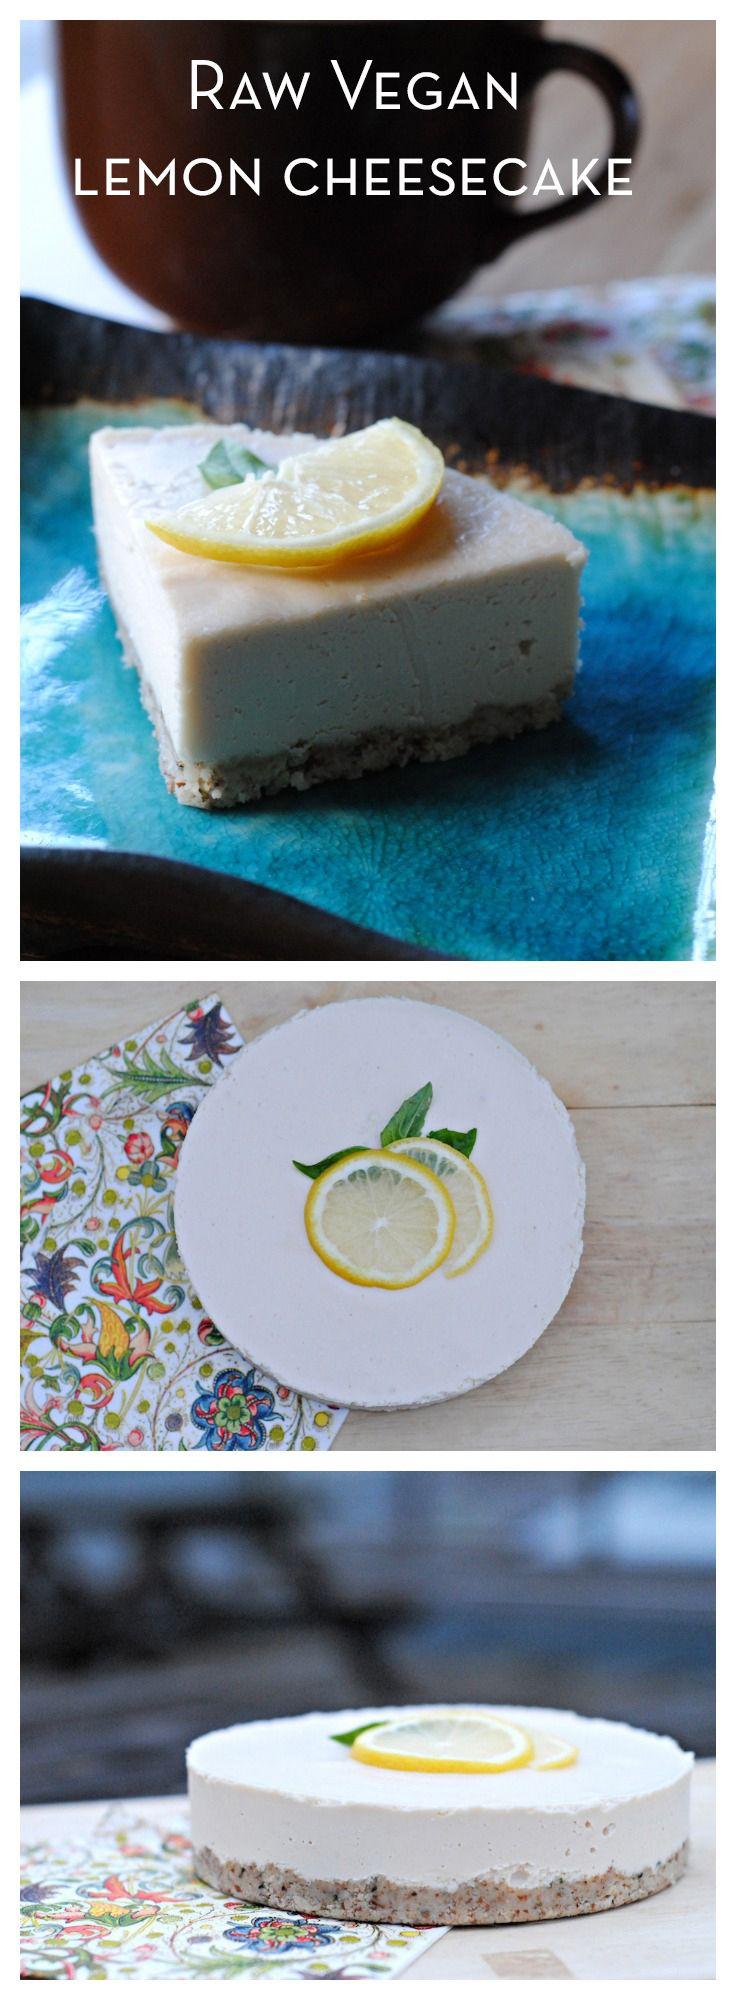 Raw Vegan Lemon Cheesecake. http://theblenderist.com/raw-vegan-lemon-cheesecake/